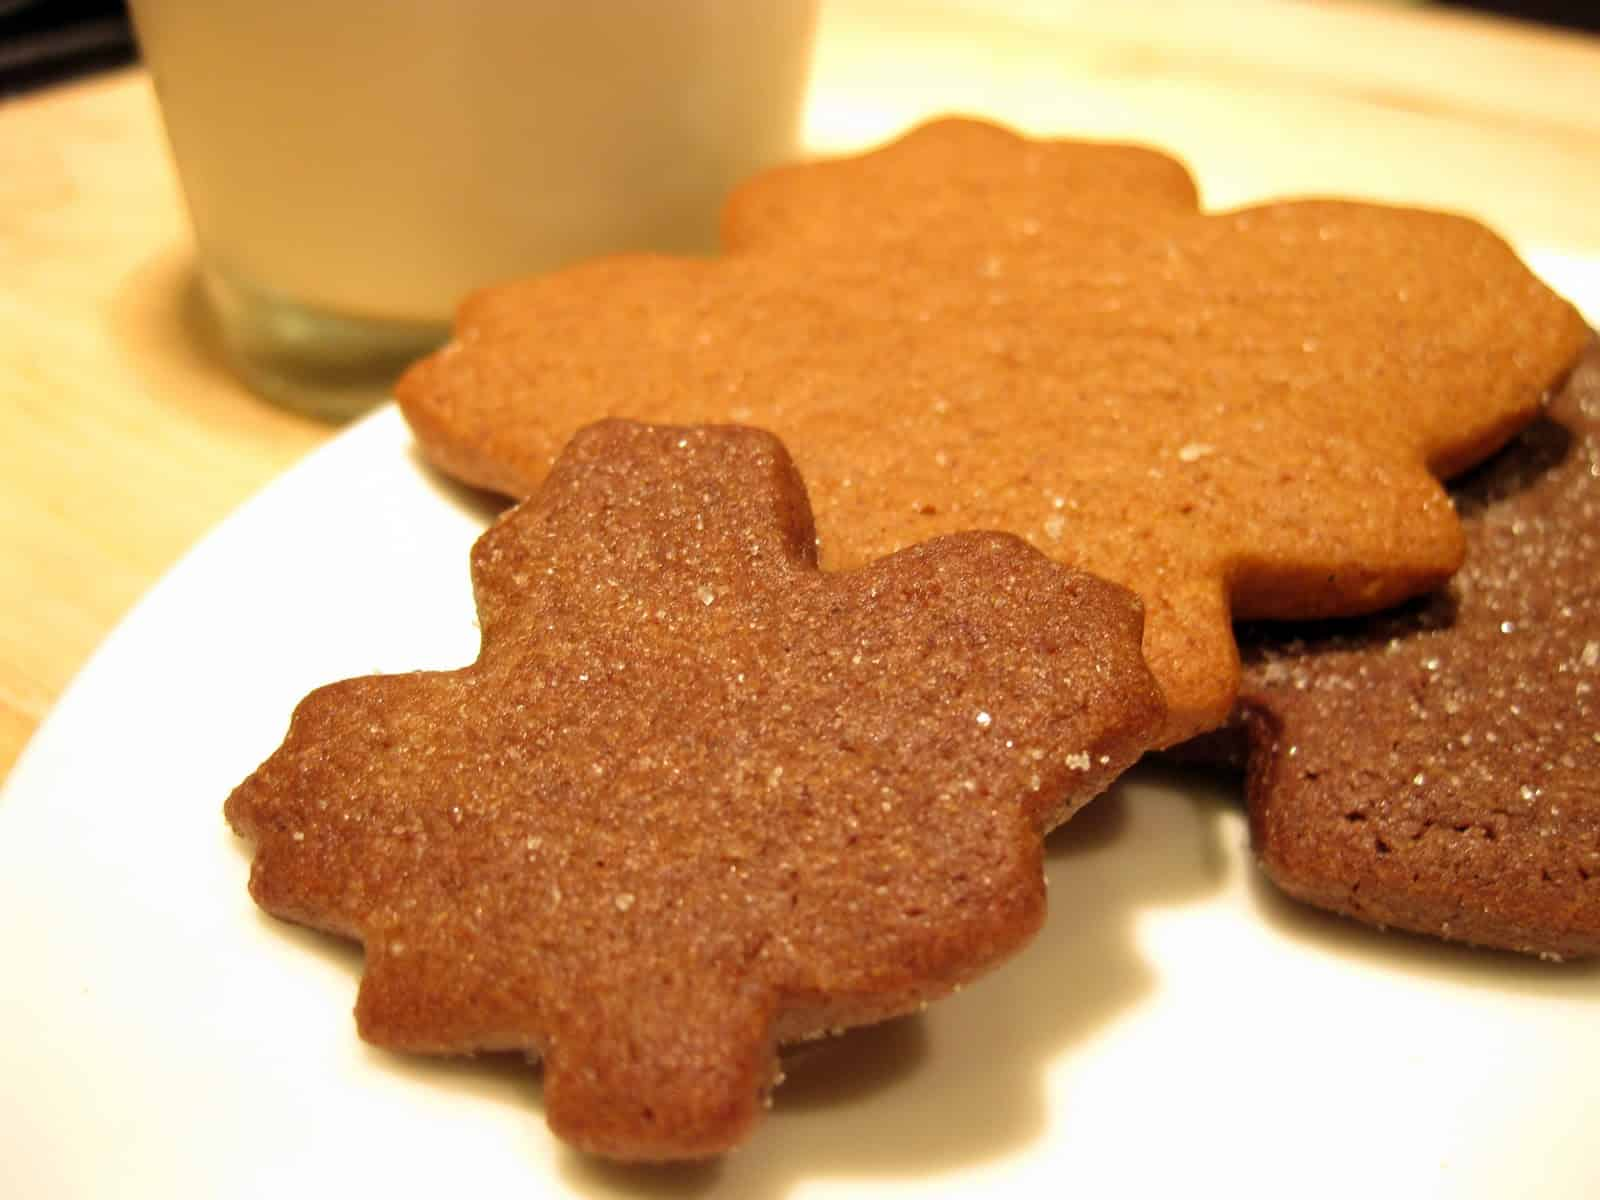 Gingerbread leaves